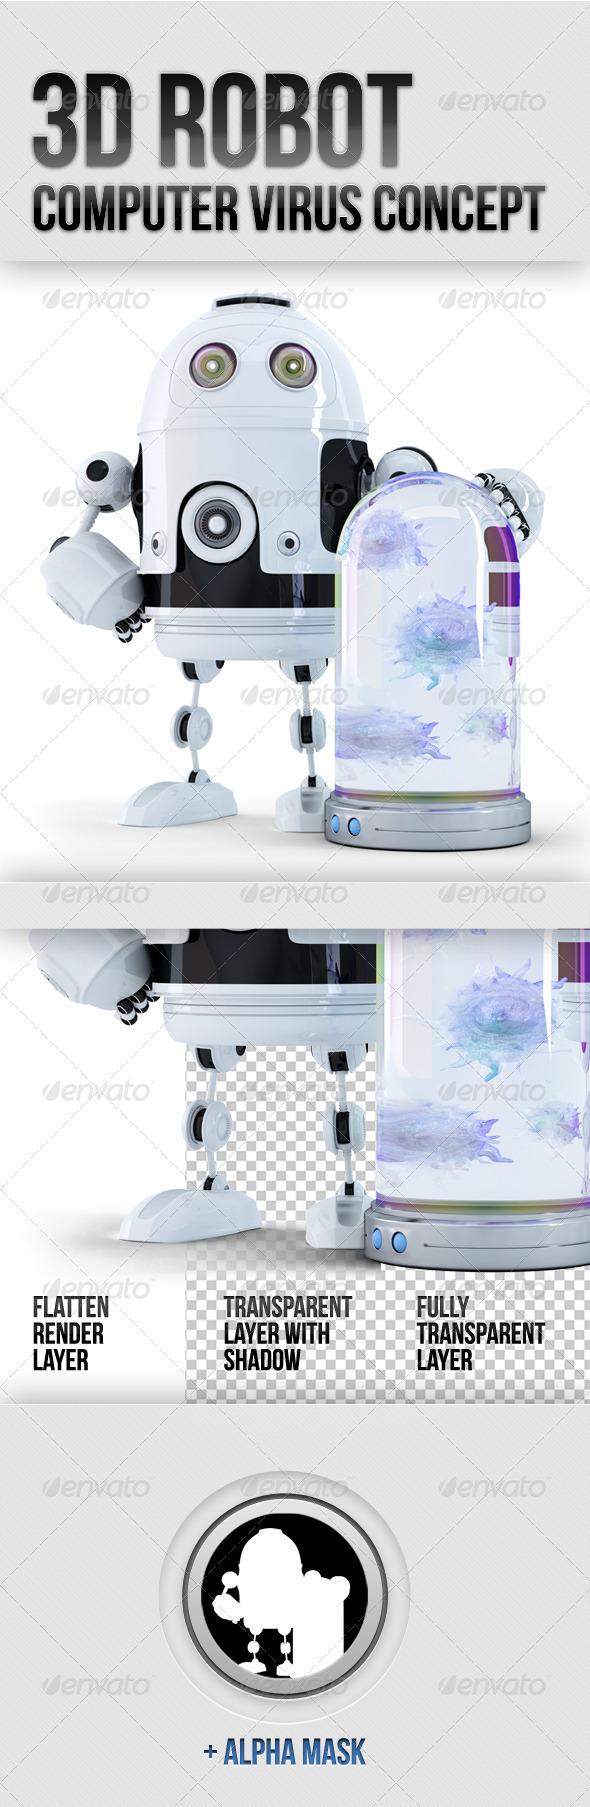 GraphicRiver 3D Robot Computer Virus Concept 5883329